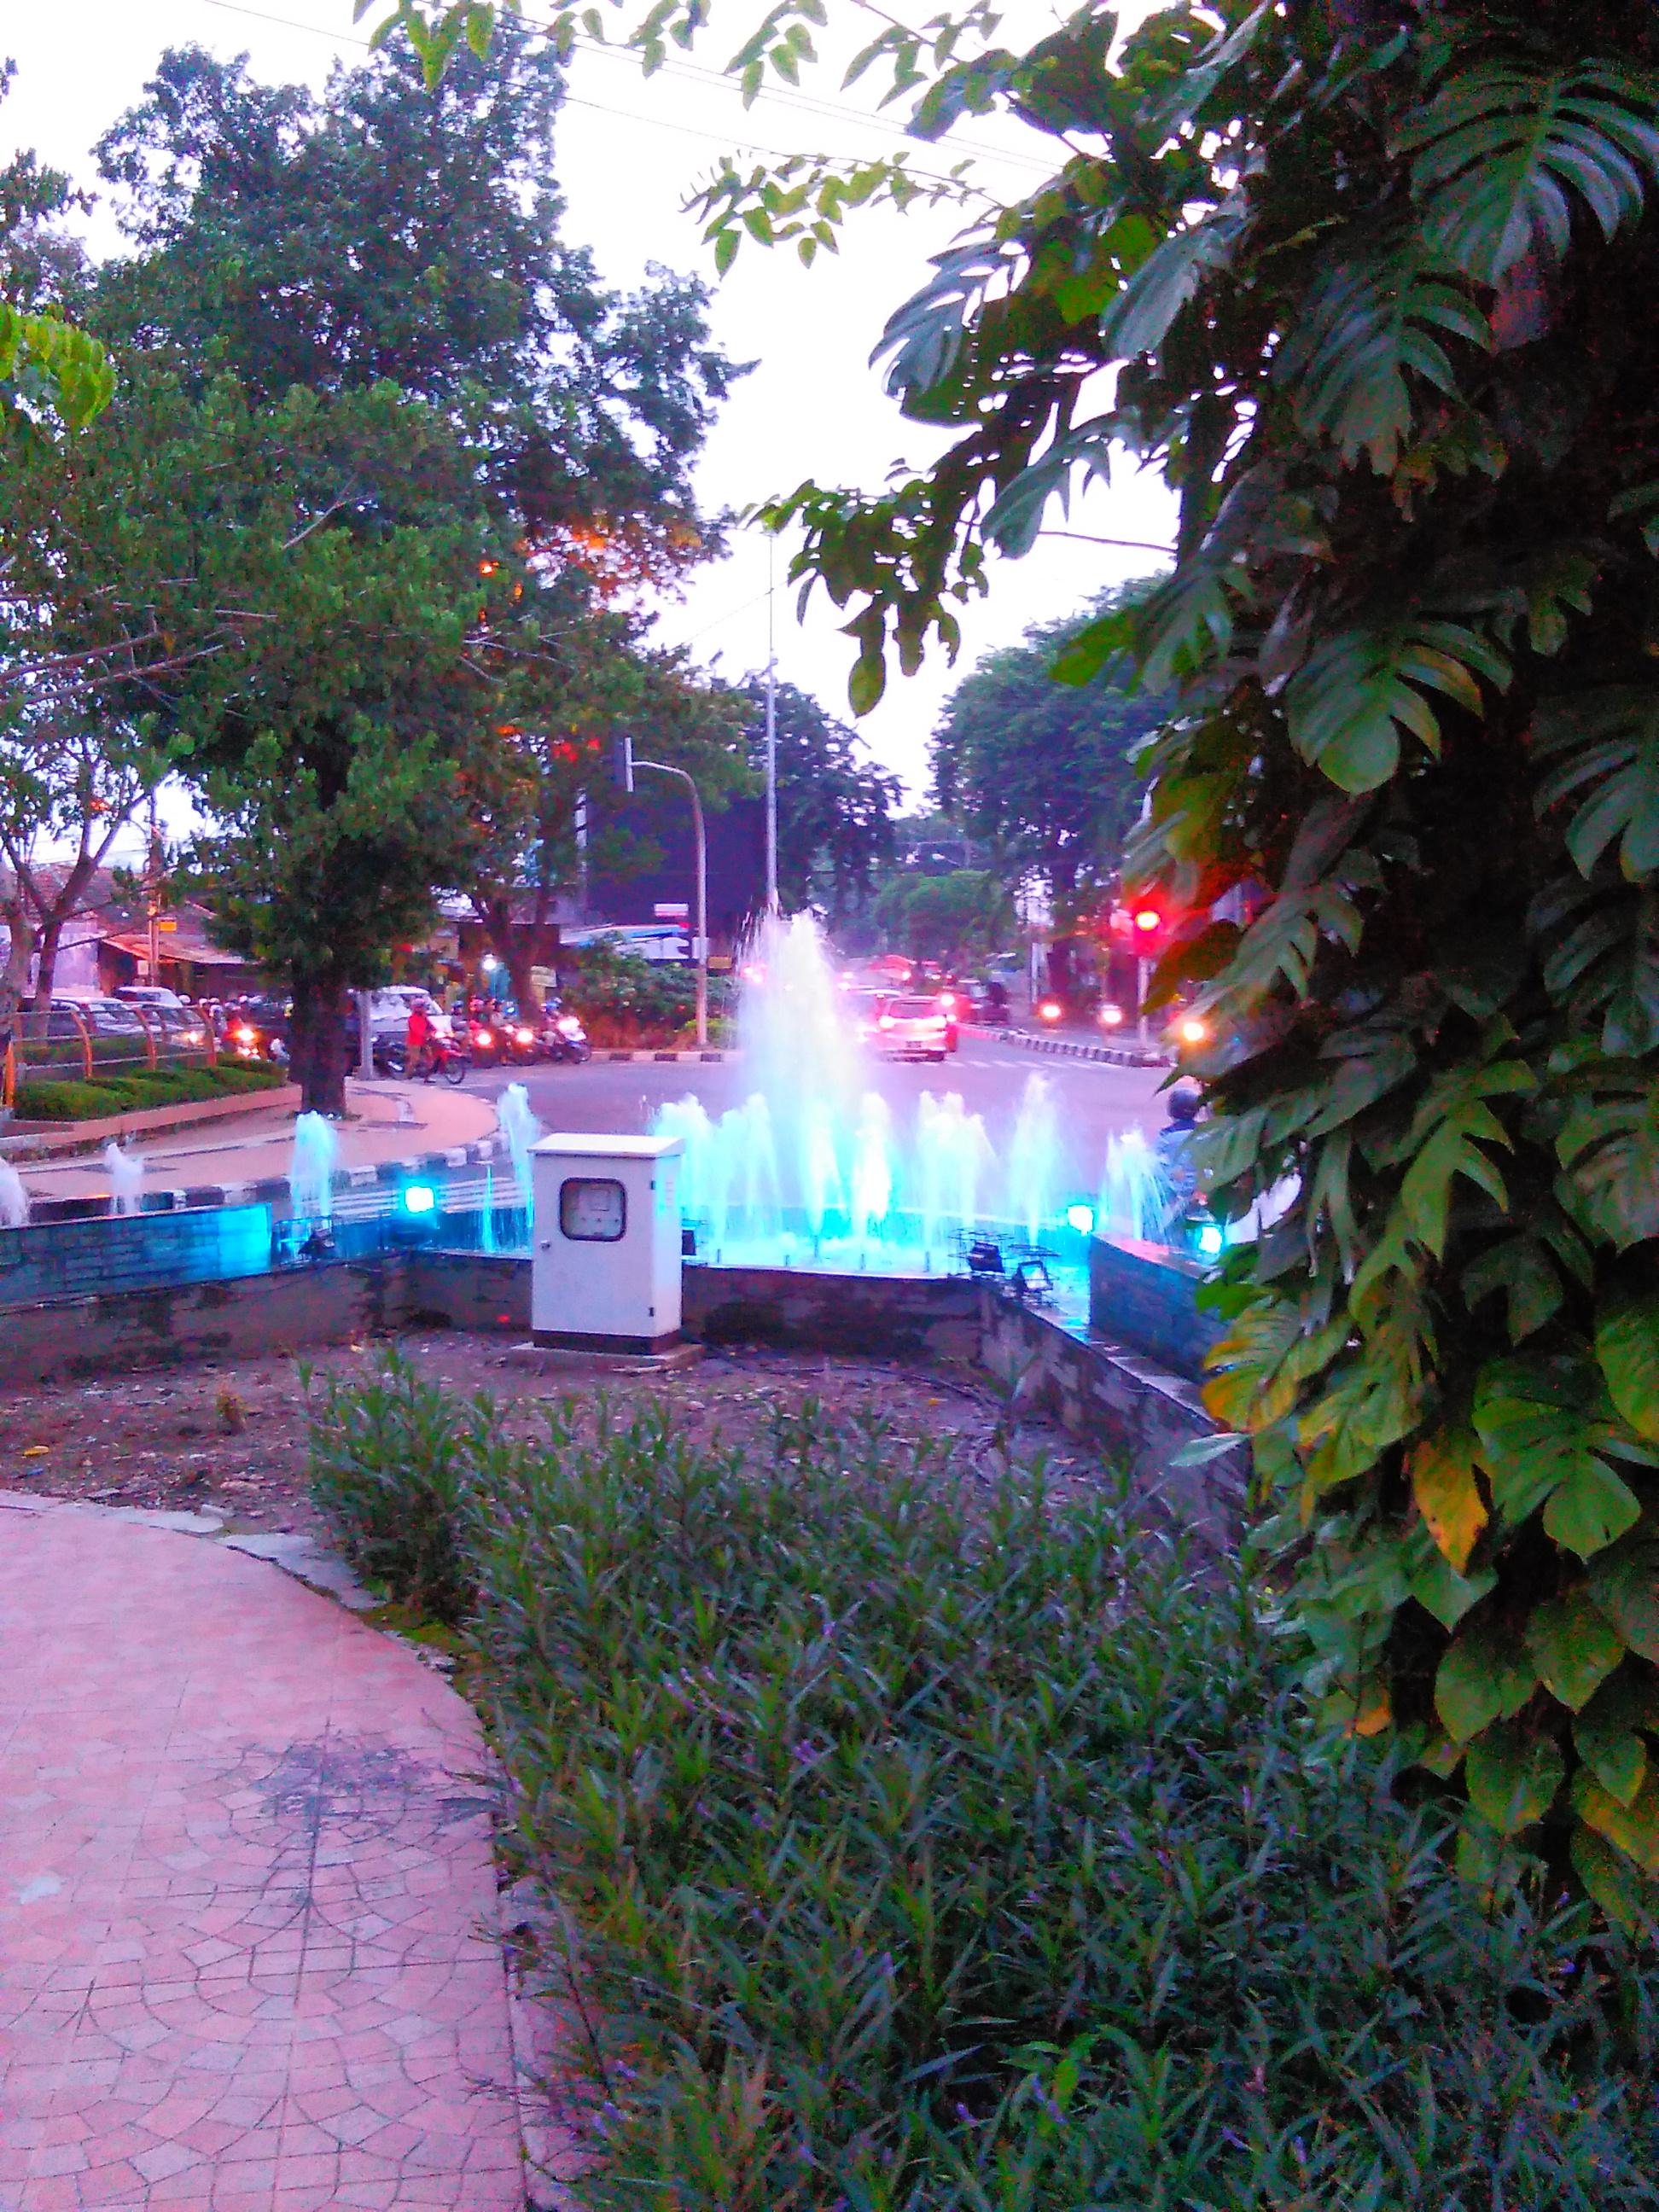 Air Mancur Taman Kota Pesona Surabaya Image Buah Undaan